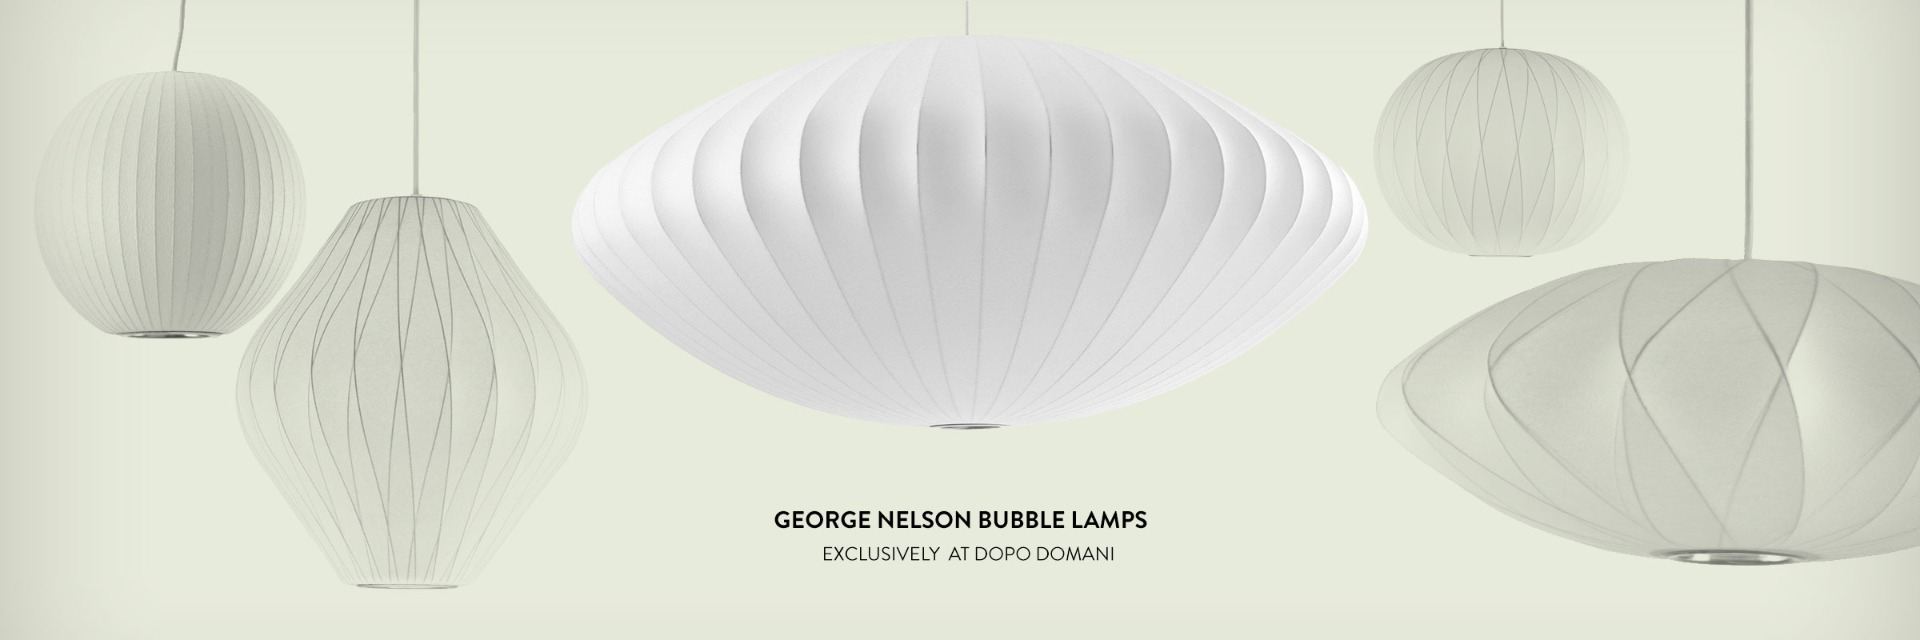 George Nelson Bubble Lamps